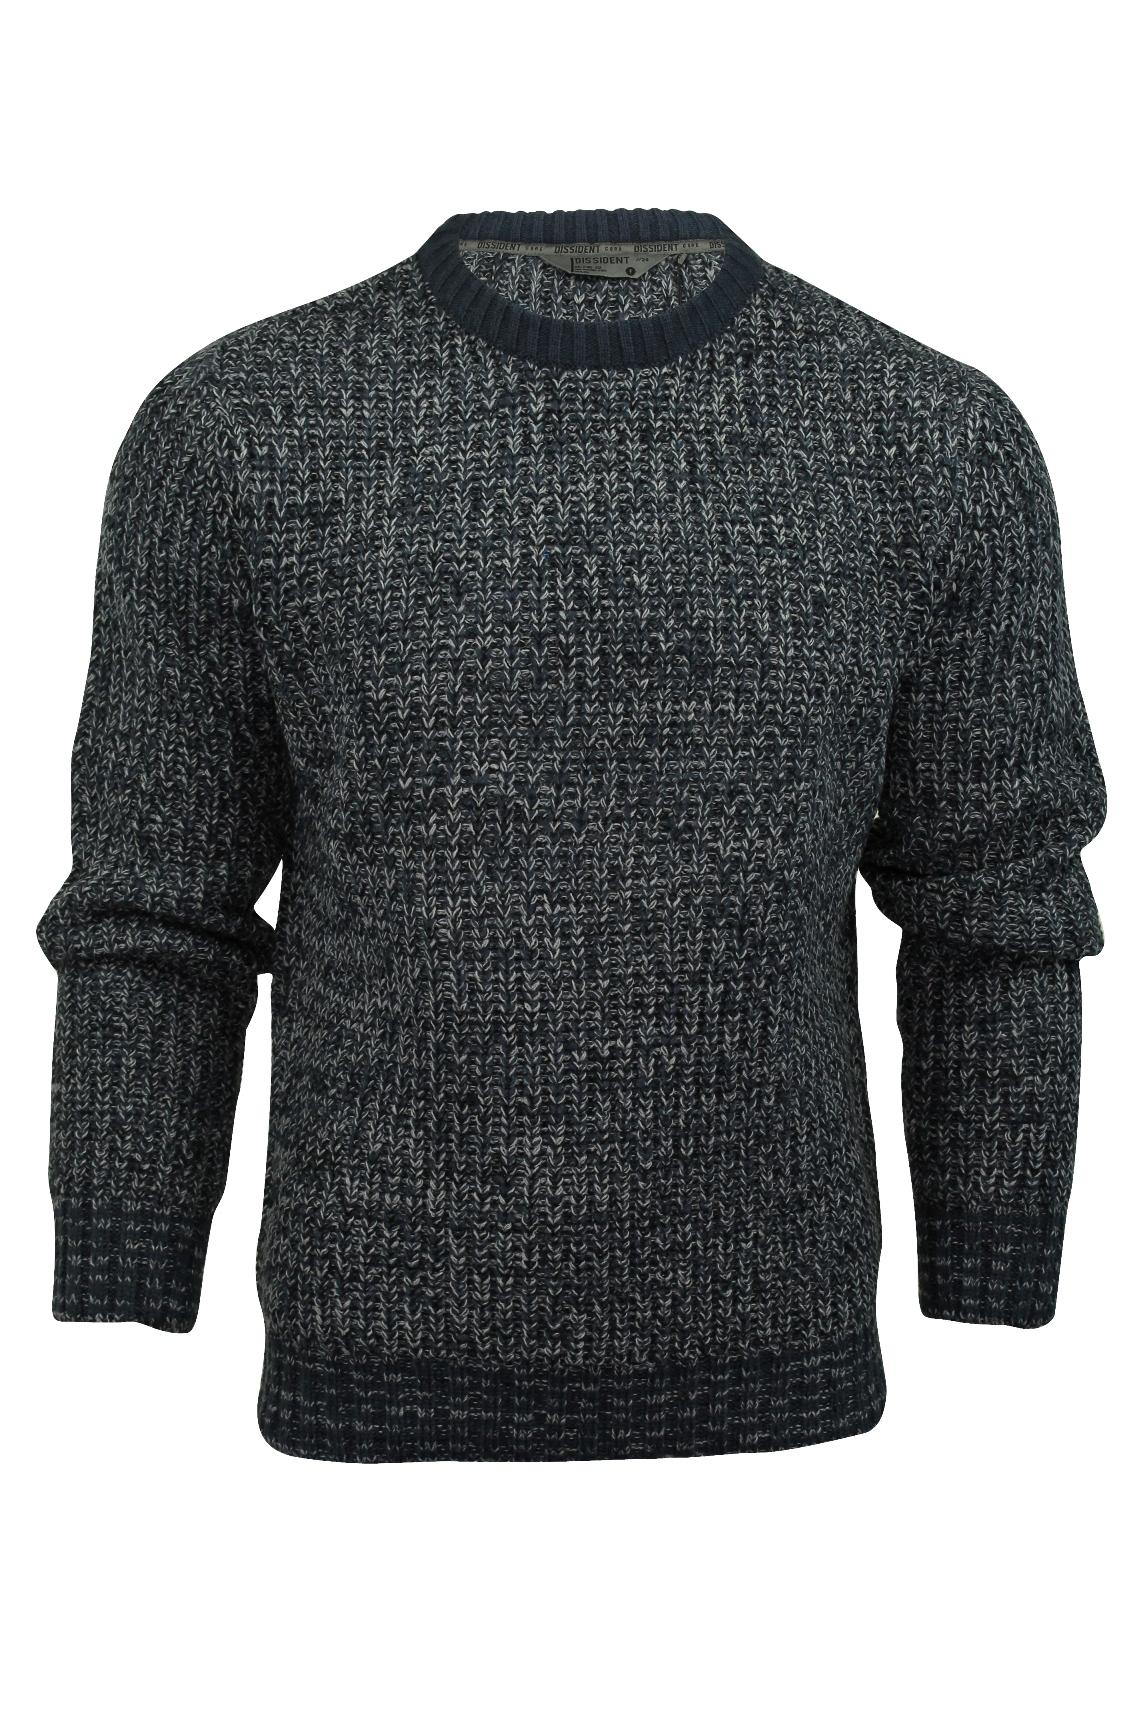 dissident jemison herren pullover mit schalkragen kontrastfarben. Black Bedroom Furniture Sets. Home Design Ideas